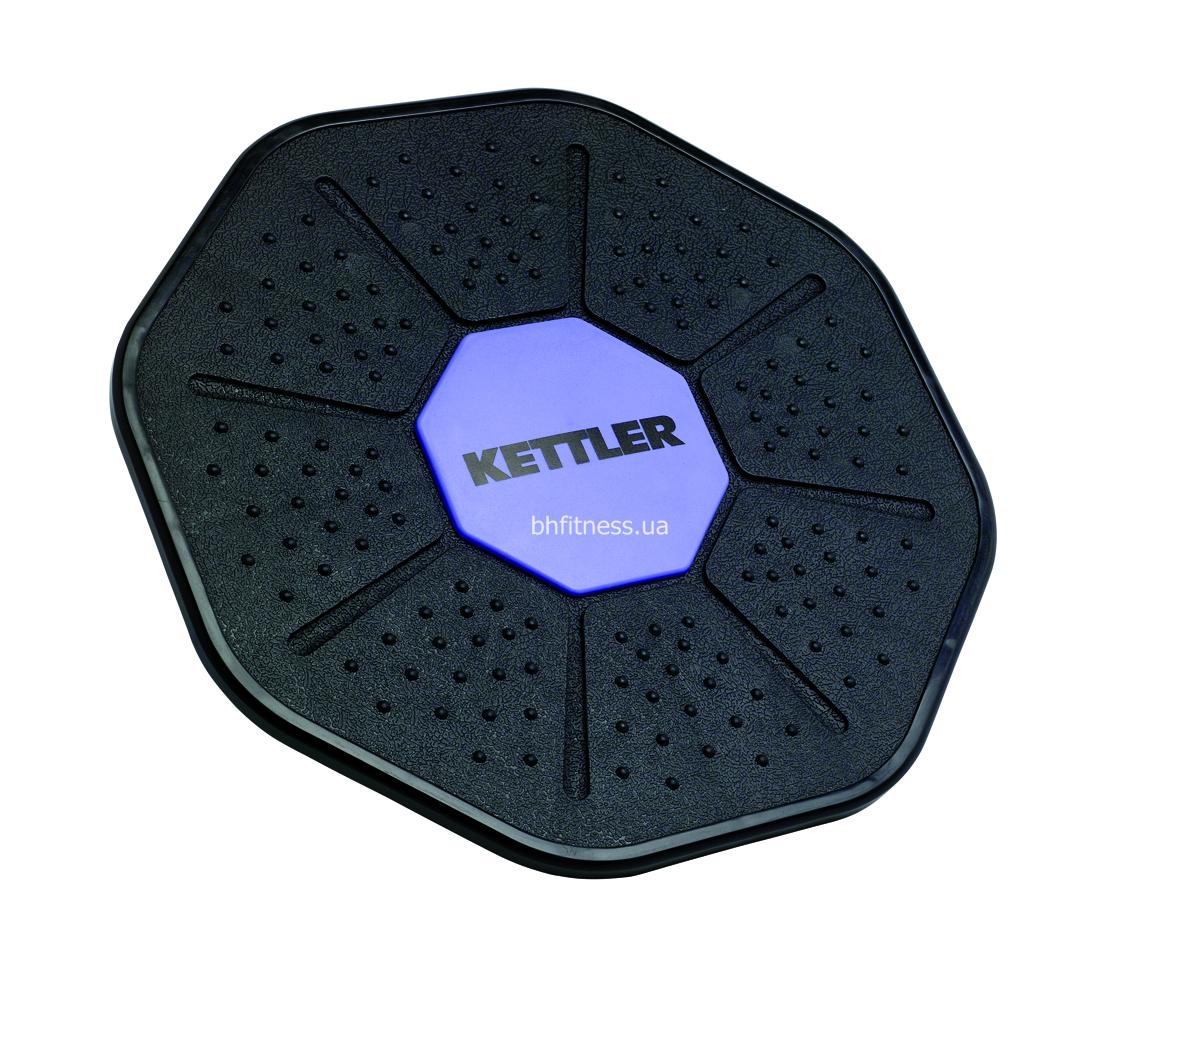 kettler Балансировочная платформа Kettler 7350-142